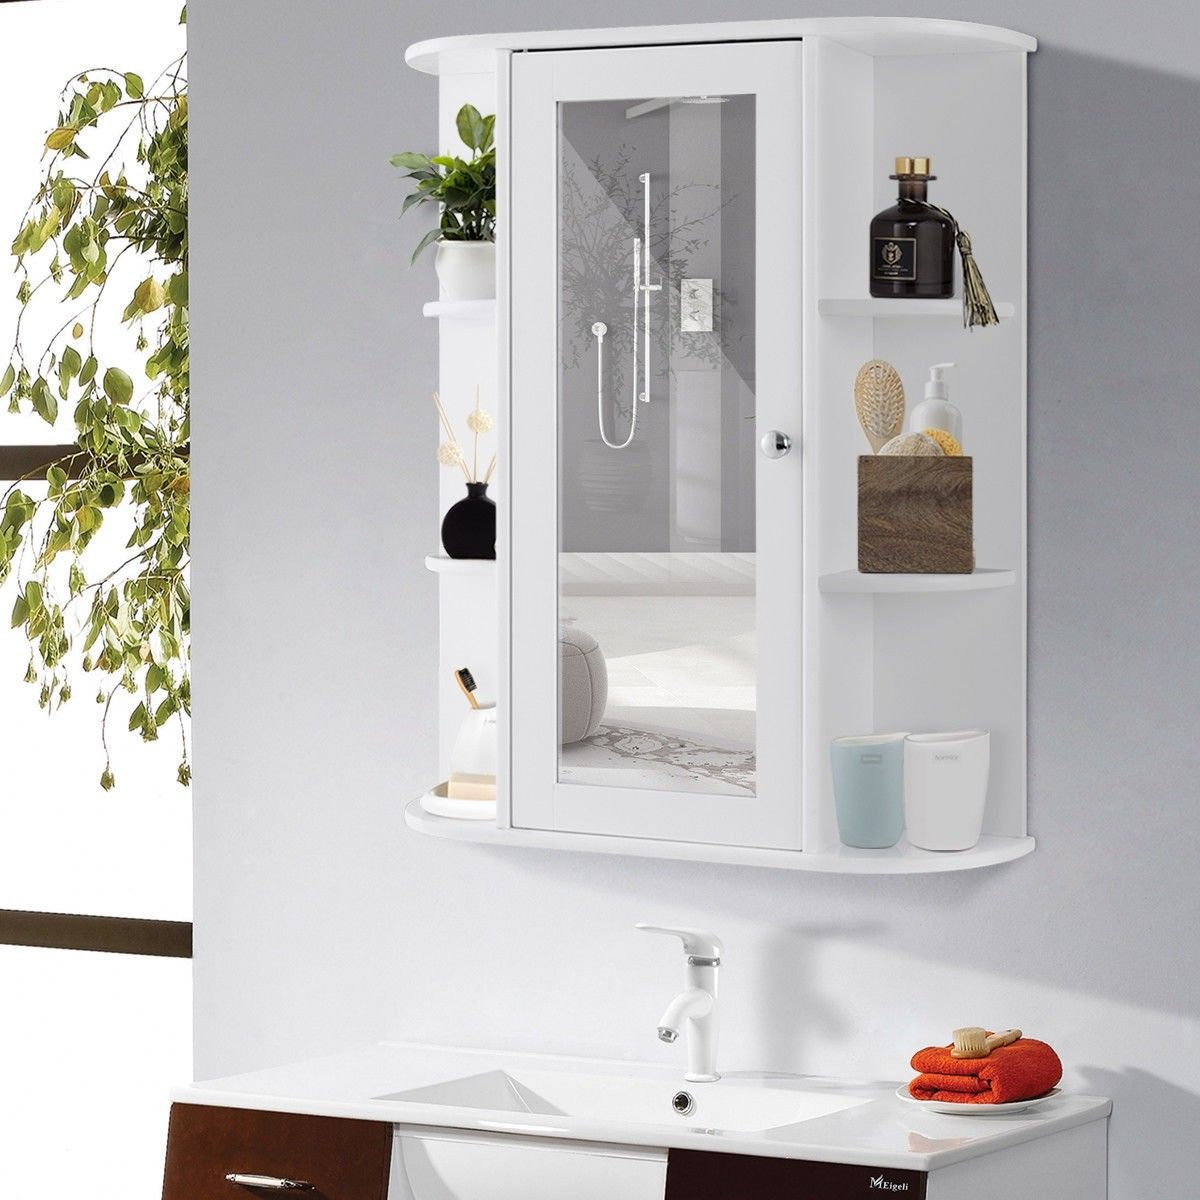 Bathroom Cabinet Single Door Shelves Wall Mount Cabinet Wall Mounted Cabinet Bathroom Space Saver Wall Mounted Bathroom Cabinets